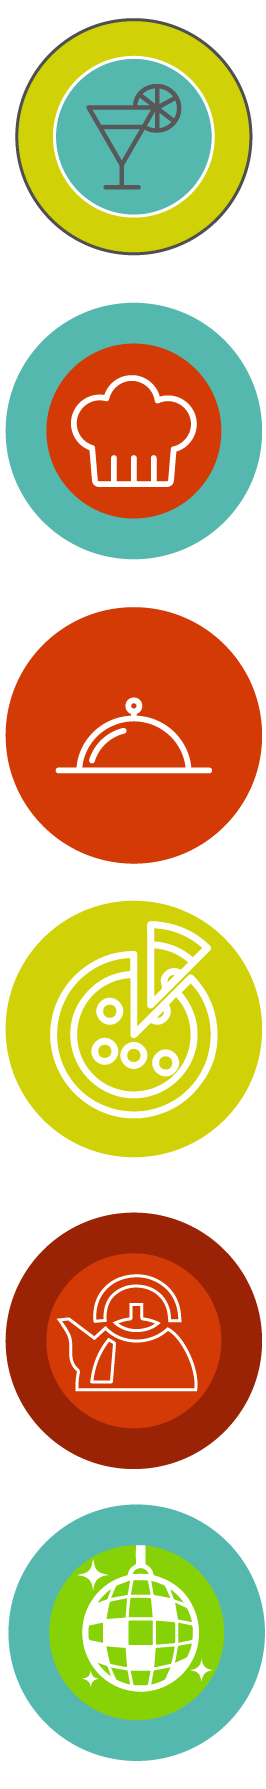 iconos_restaurantes